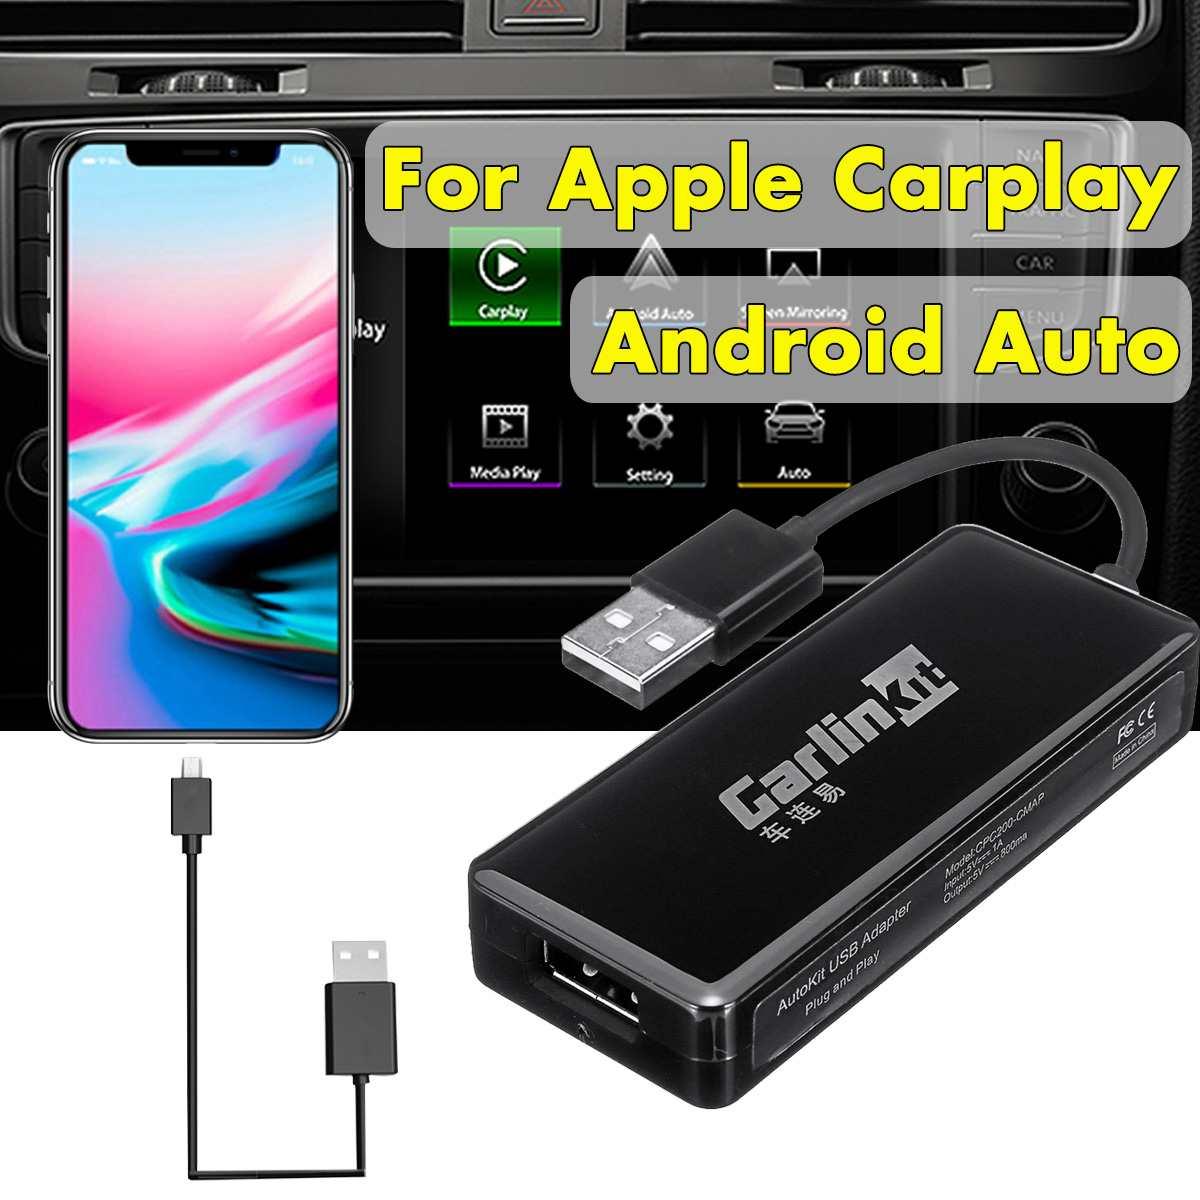 Carlinkit USB Smart Link pour Apple Carplay voiture lien Dongle pour Android Navigation lecteur Mini USB Carplay Stick pour Android Auto